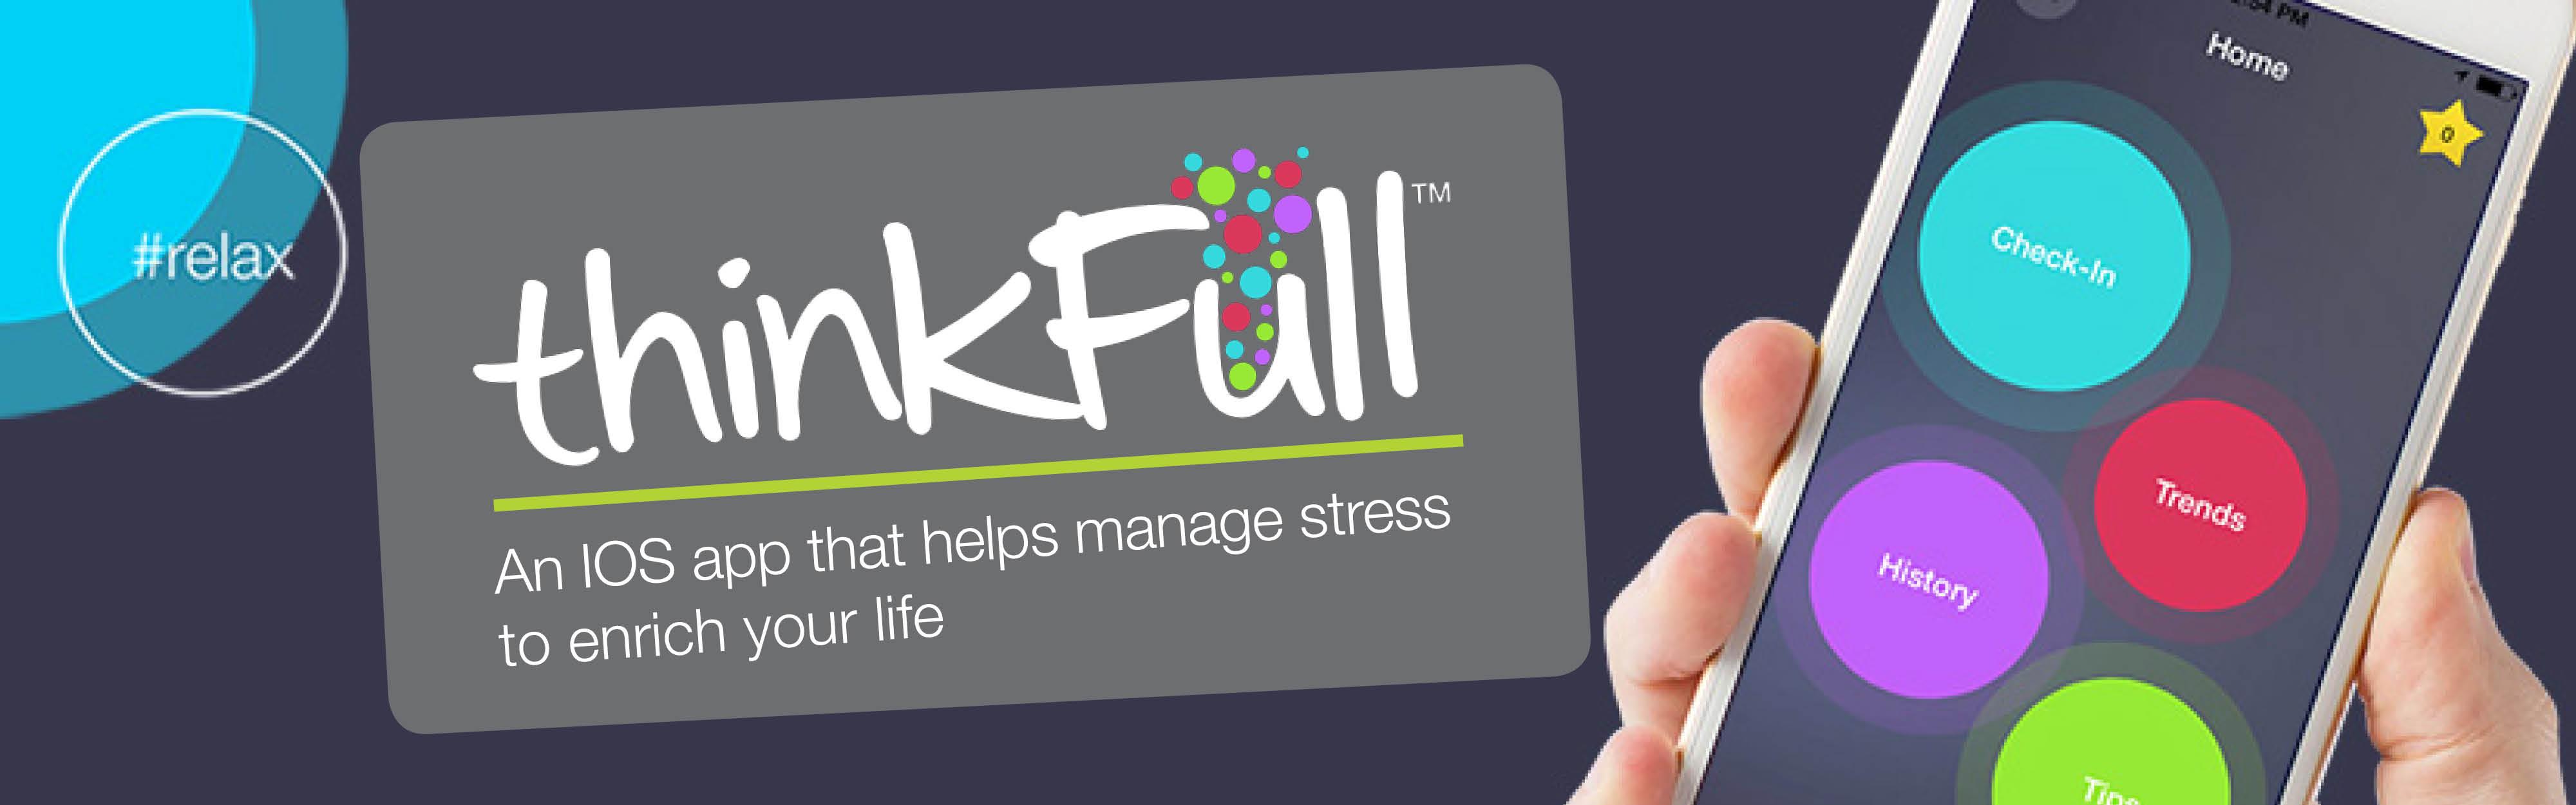 Telus donates youth-focused mental health app to CMHA